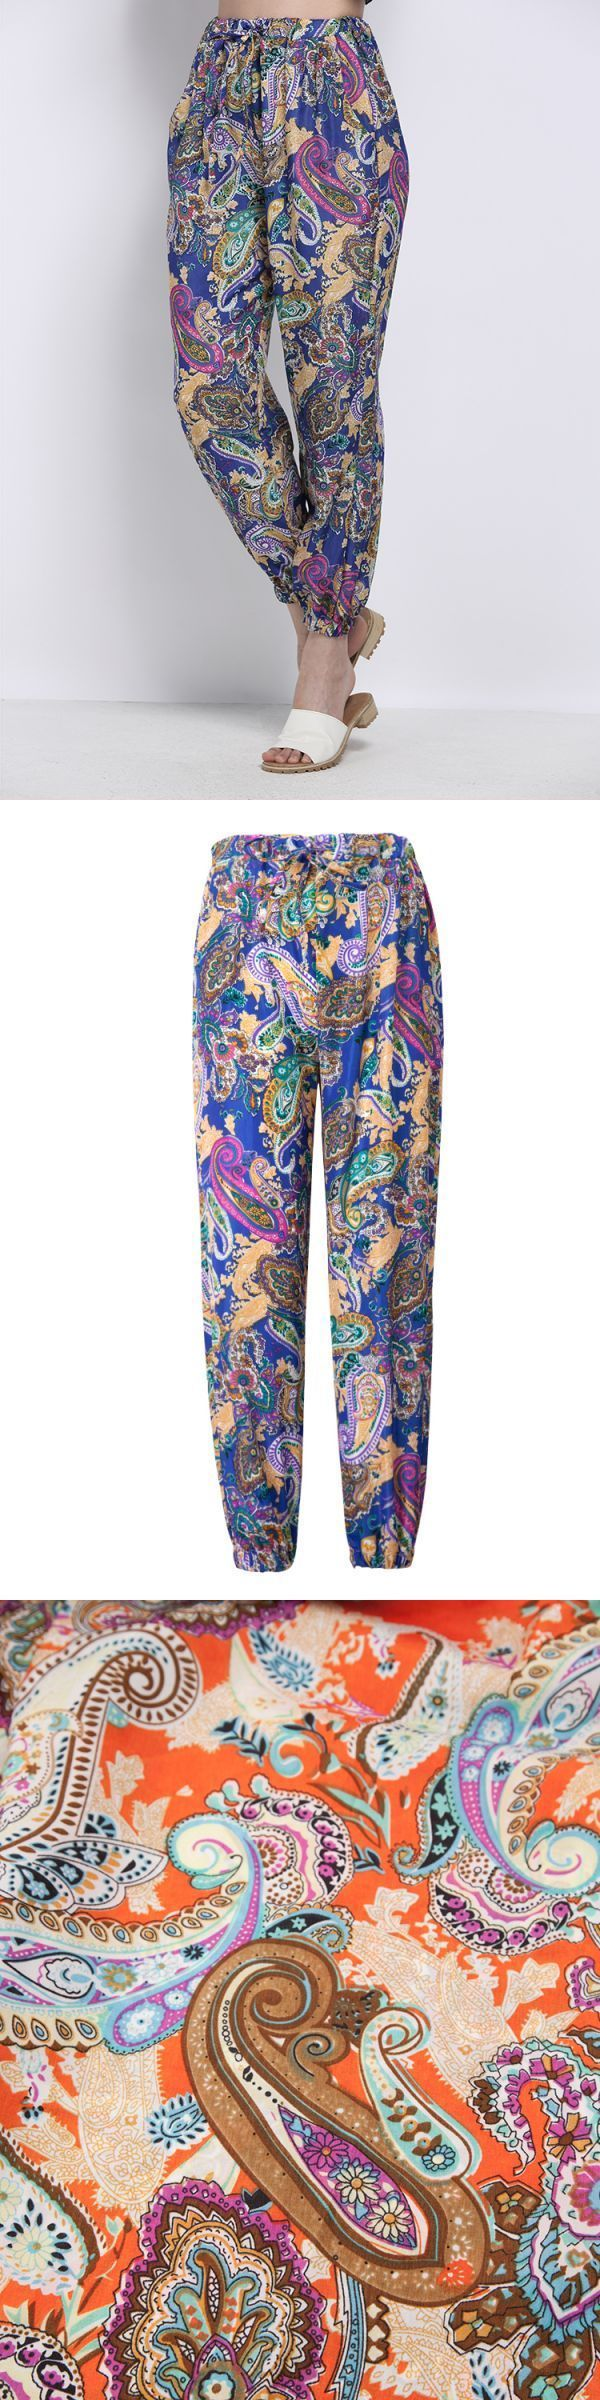 Bohemian women pattern printing elastic waist drawstring chiffon harem pants trousers pants mens #pants #trousers #british #pants #trousers #diferencia #trousers #and #pants #down #trousers #baggy #jogging #harem #pants